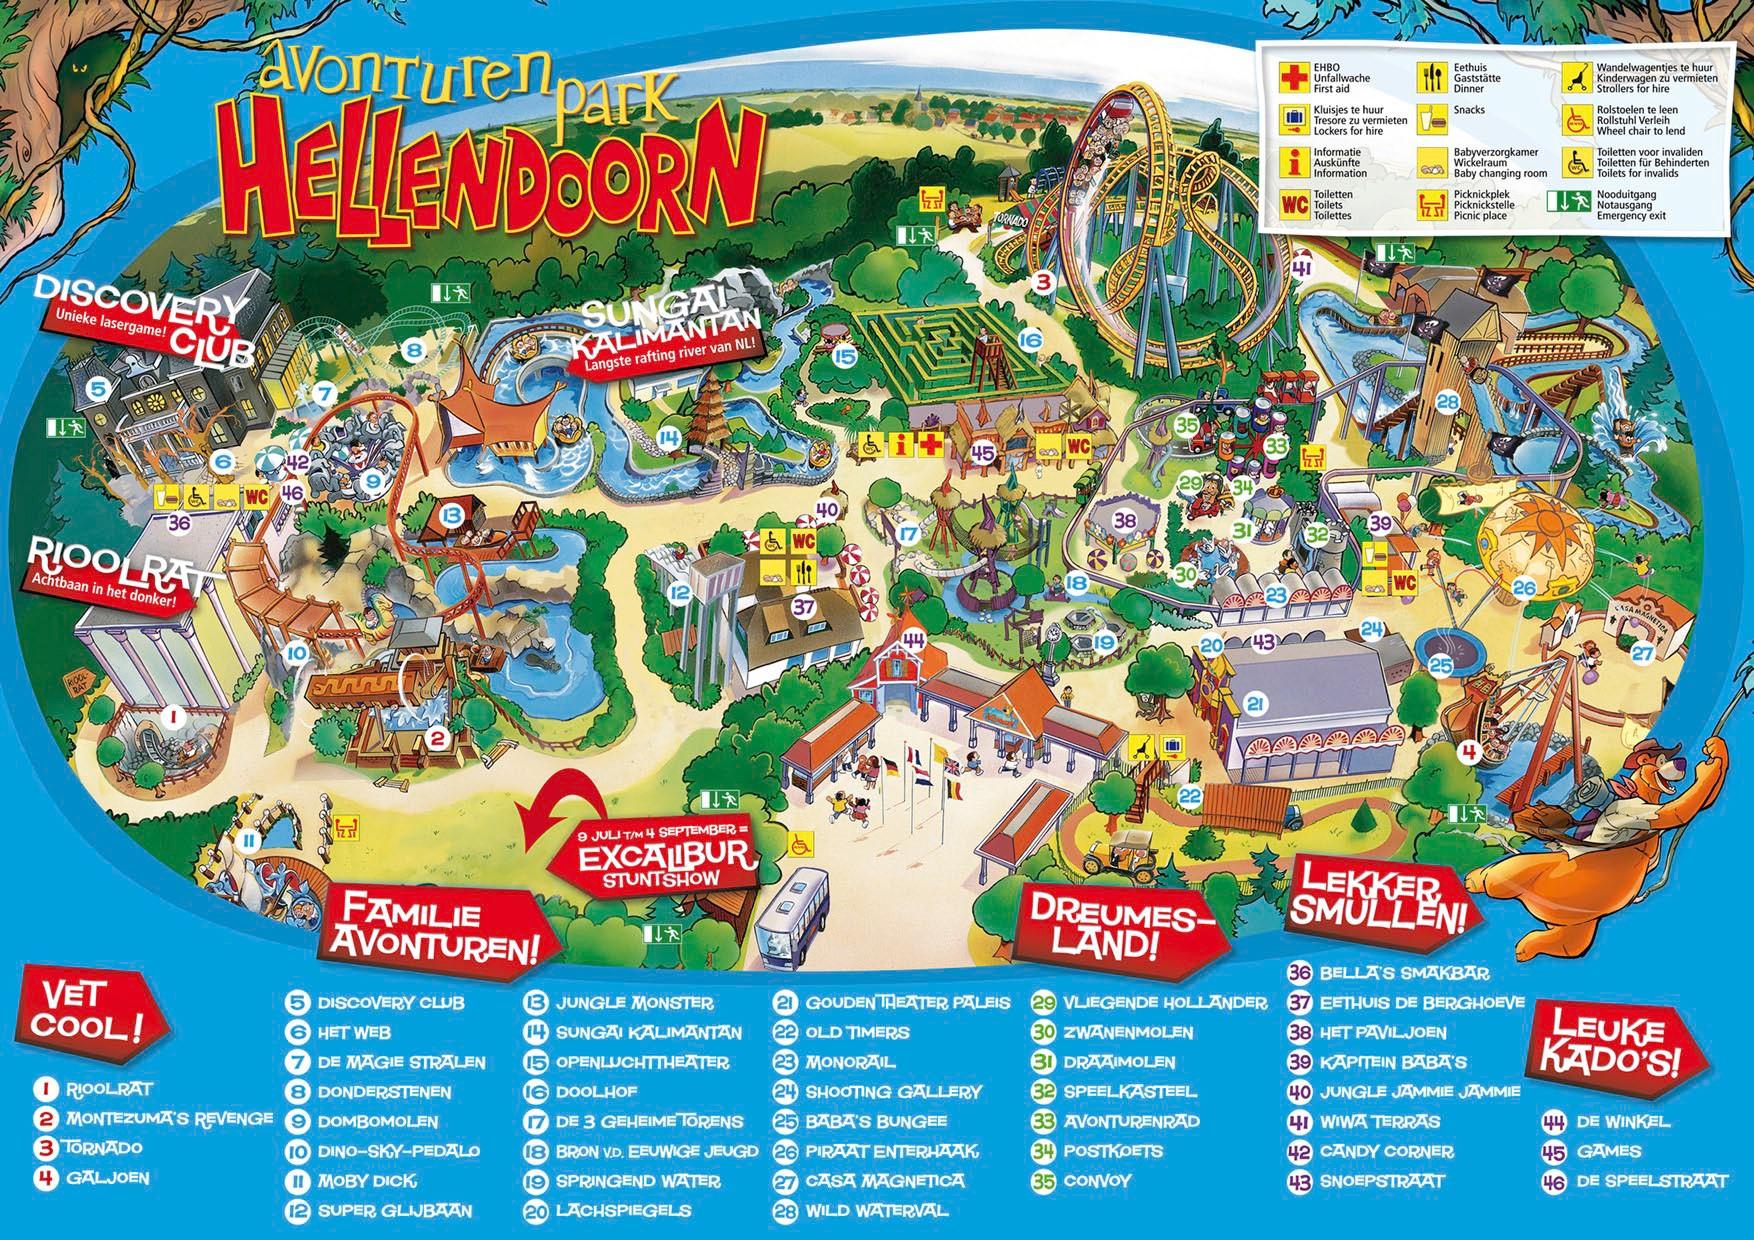 Parkmaps Parkplan Plattegrond Avonturenpark Hellendoorn